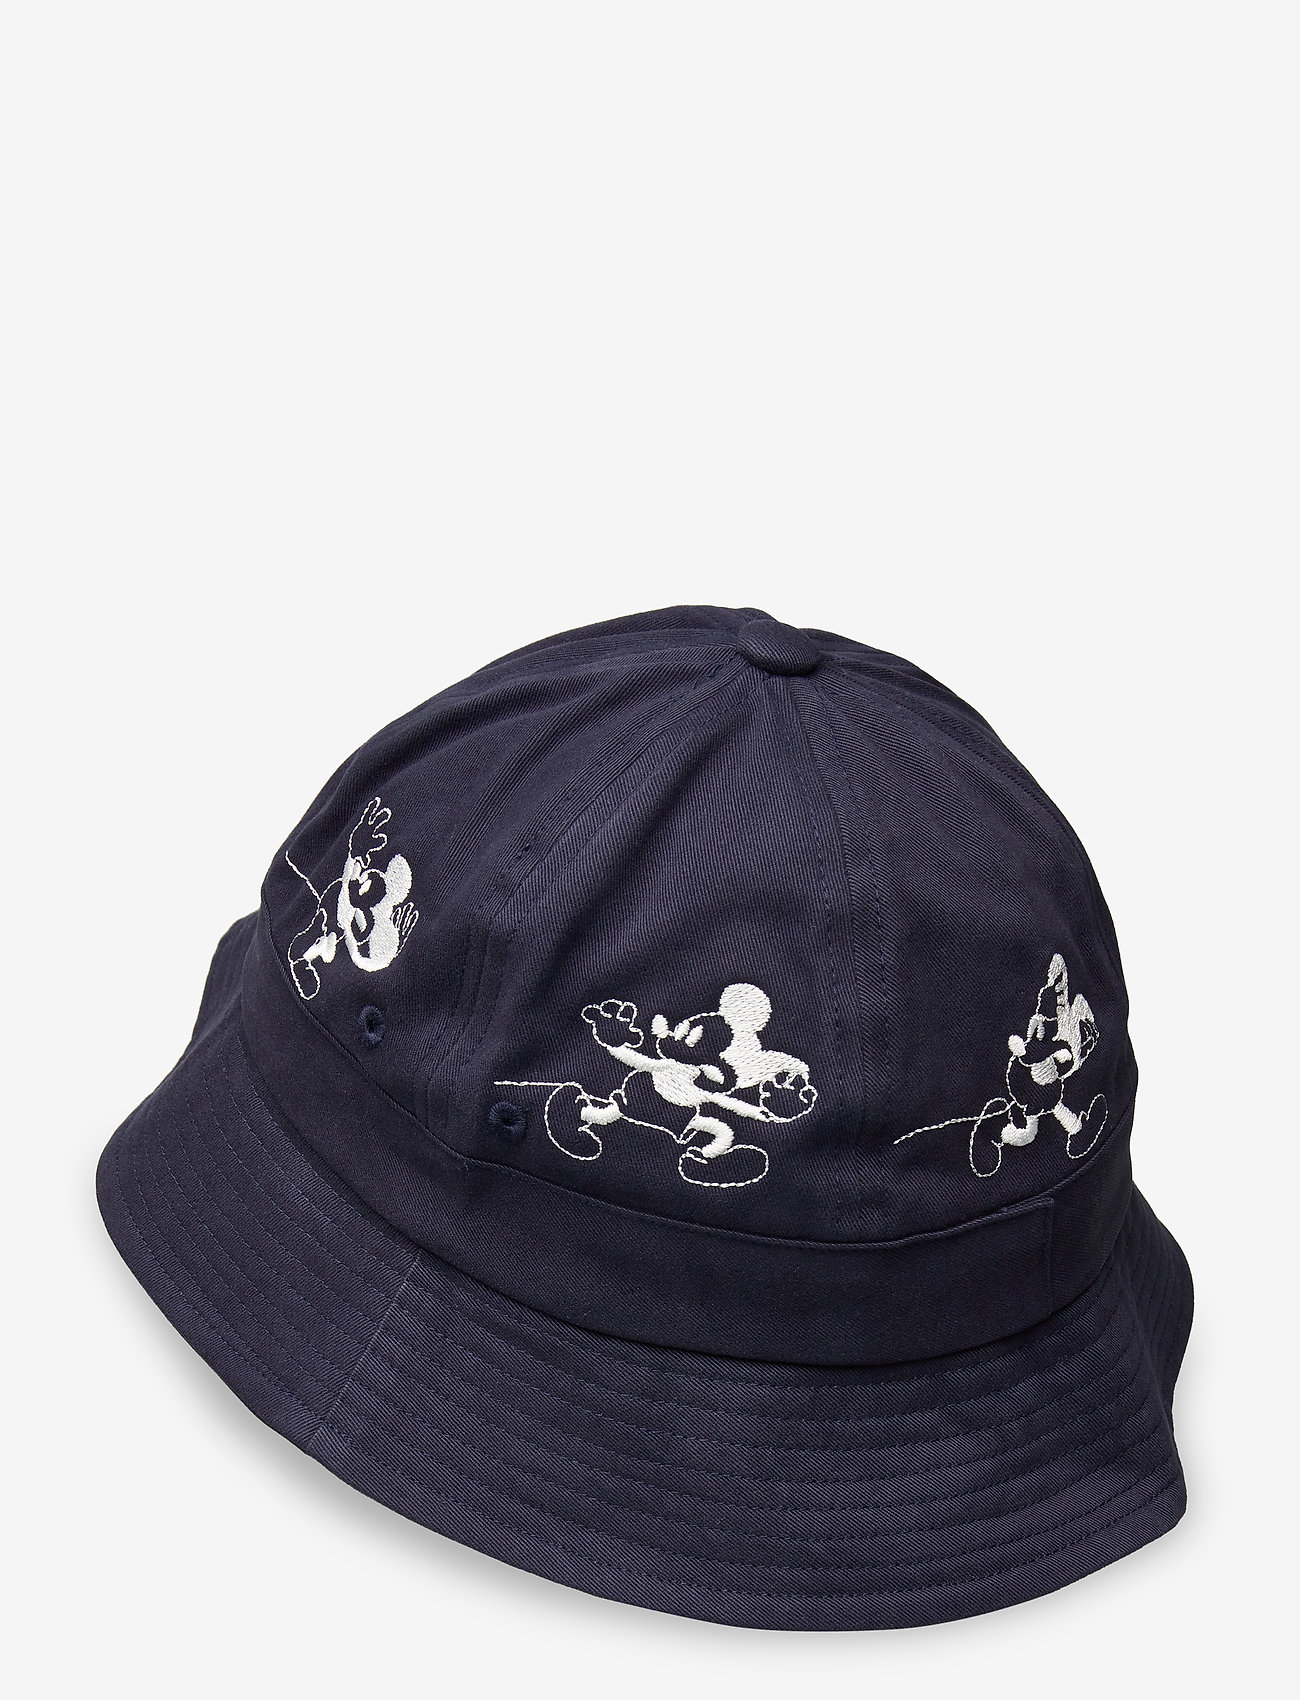 Wood Wood - Ivan bucket hat - bucket hats - navy - 1